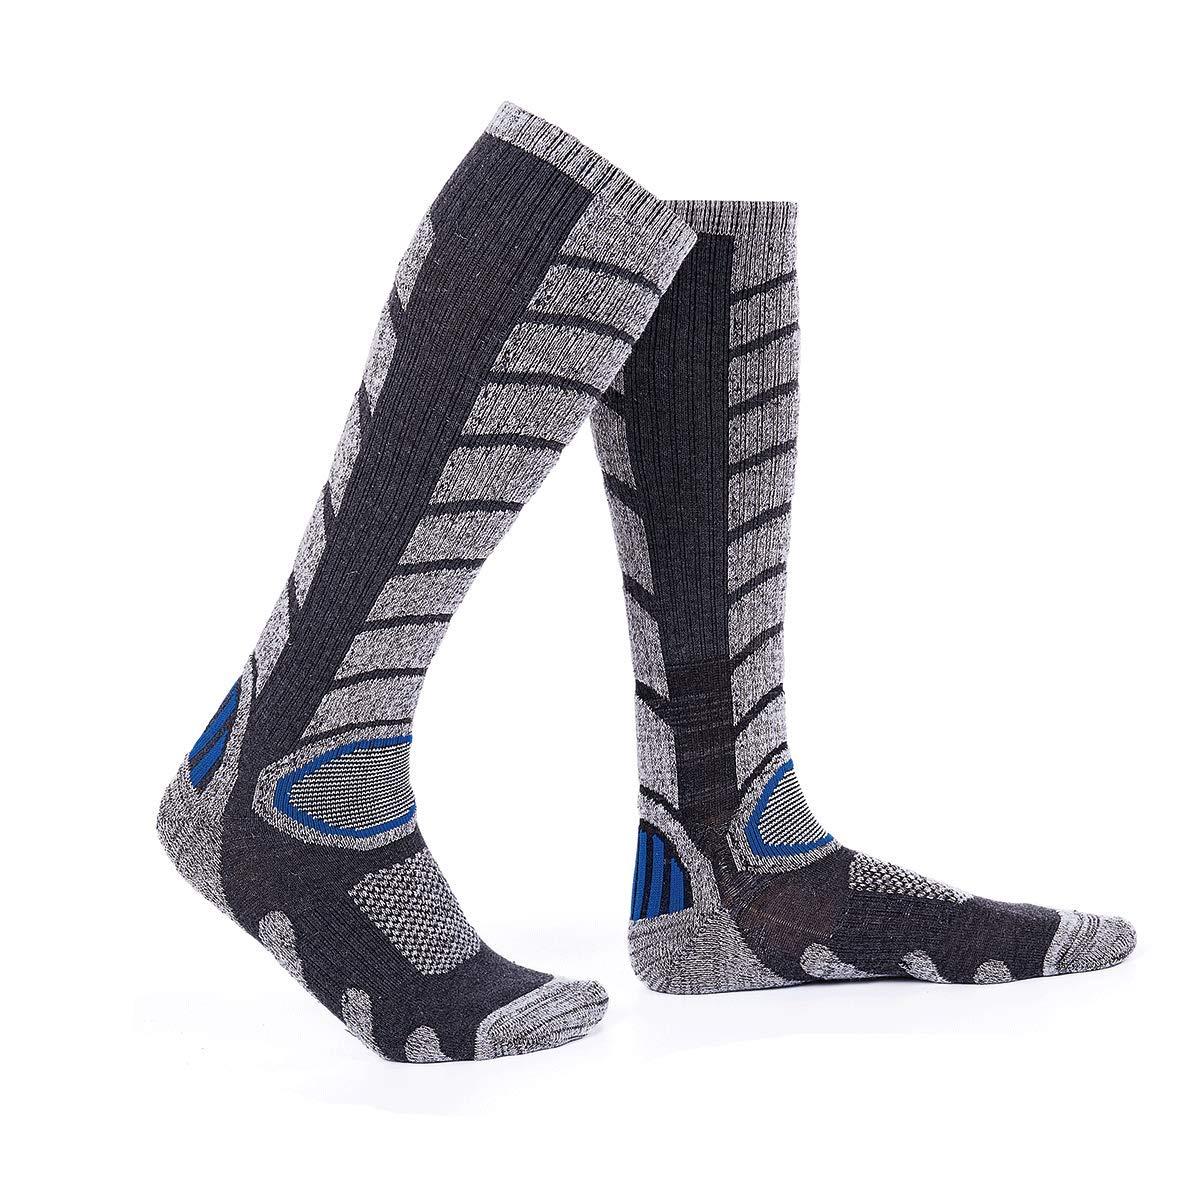 Over the Calf Warm Snow Socks for Skiing and Snowboarding Forestgrow Mens High Performance Ski Socks